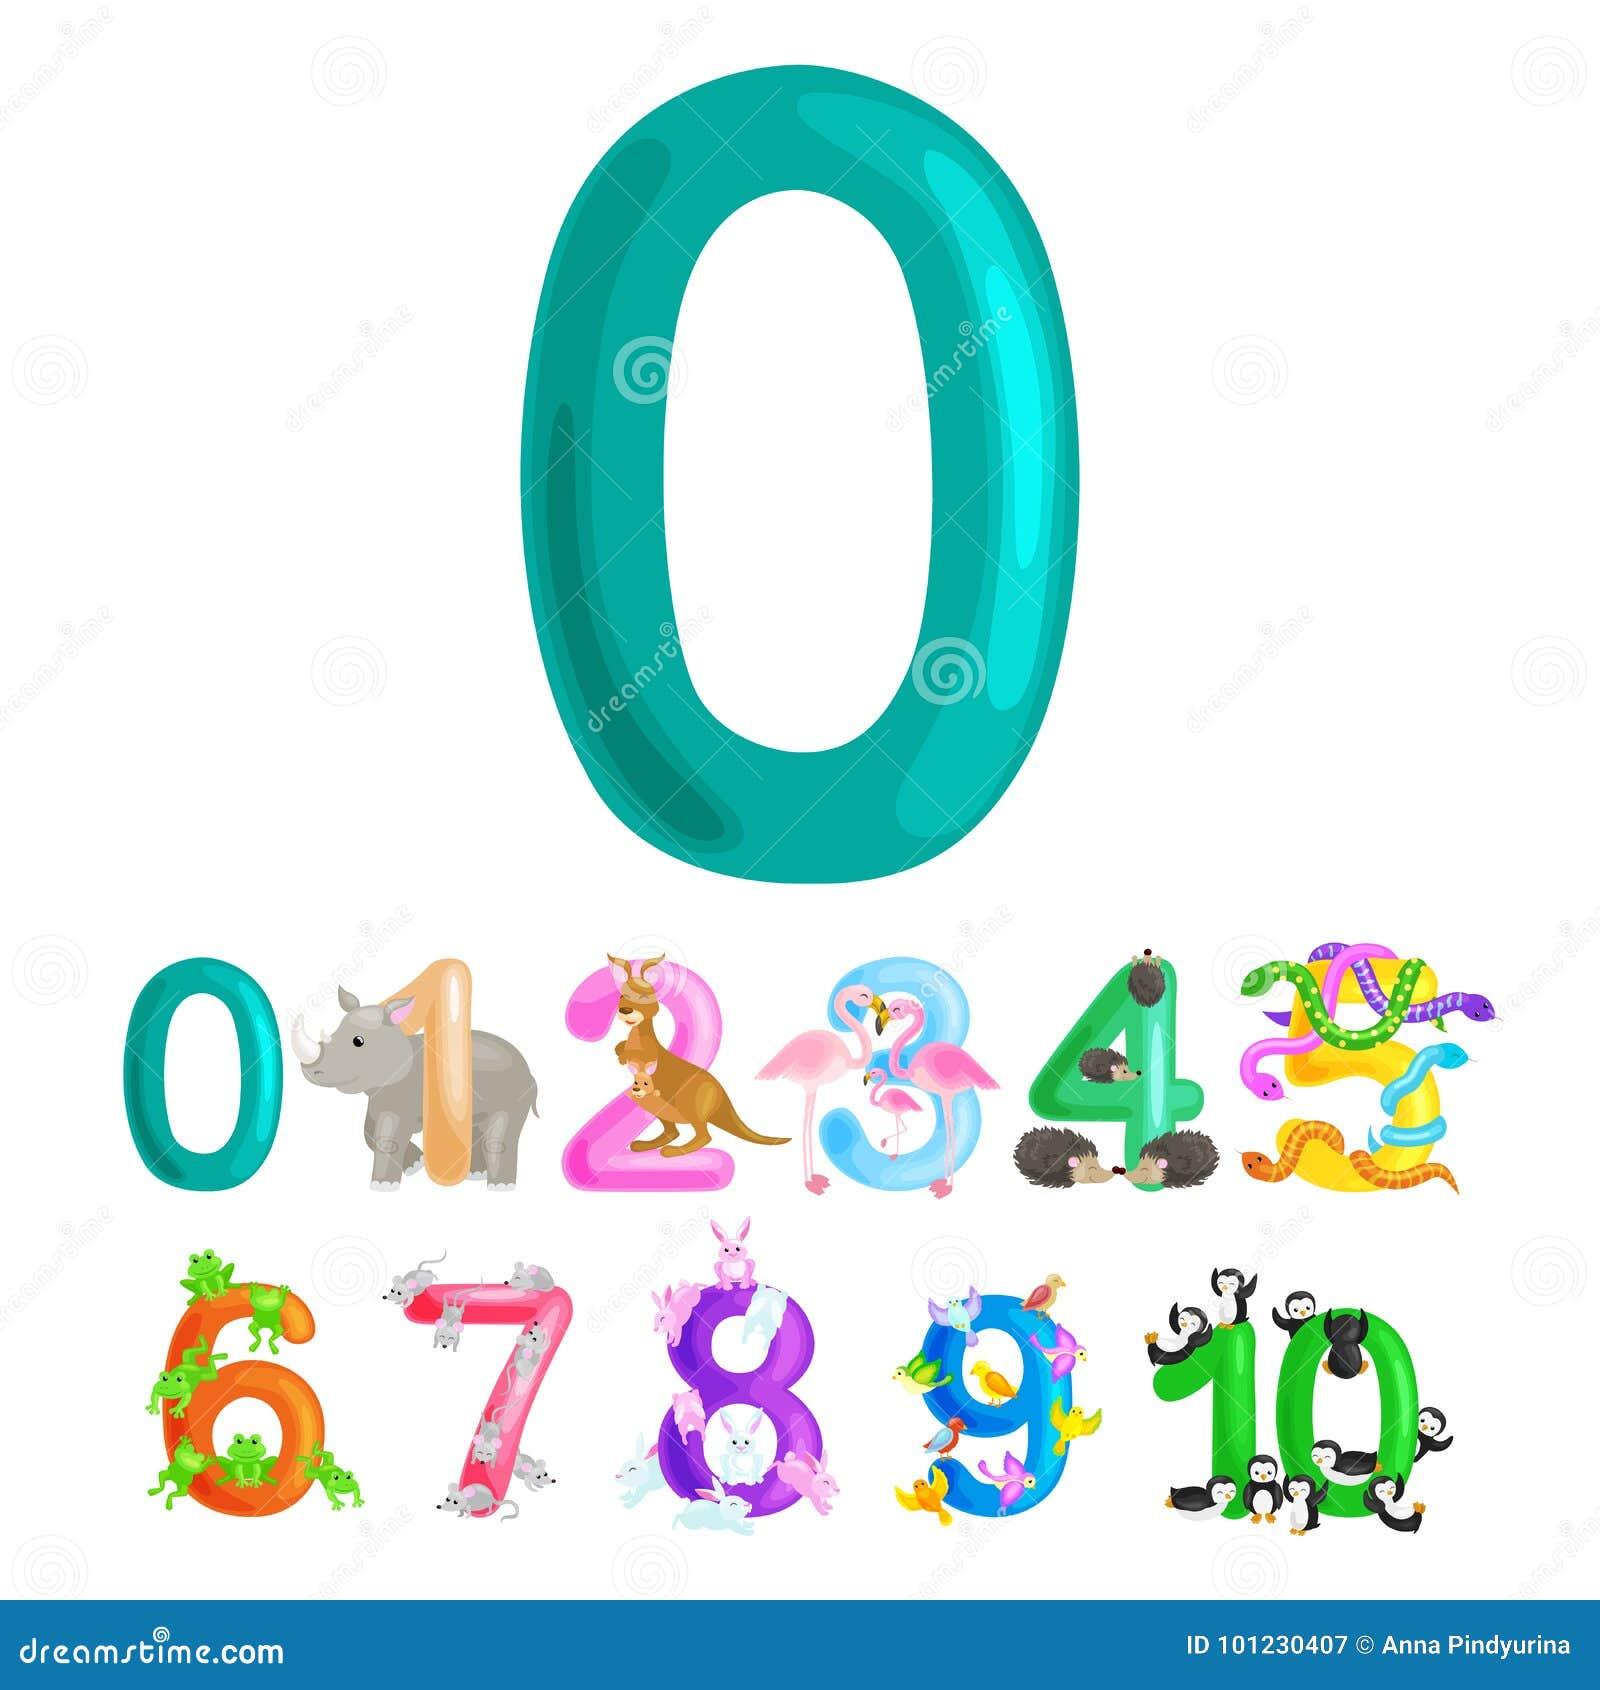 Ordinal Numbers 0 For Teaching Children Counting Zero Birdies Stock ...